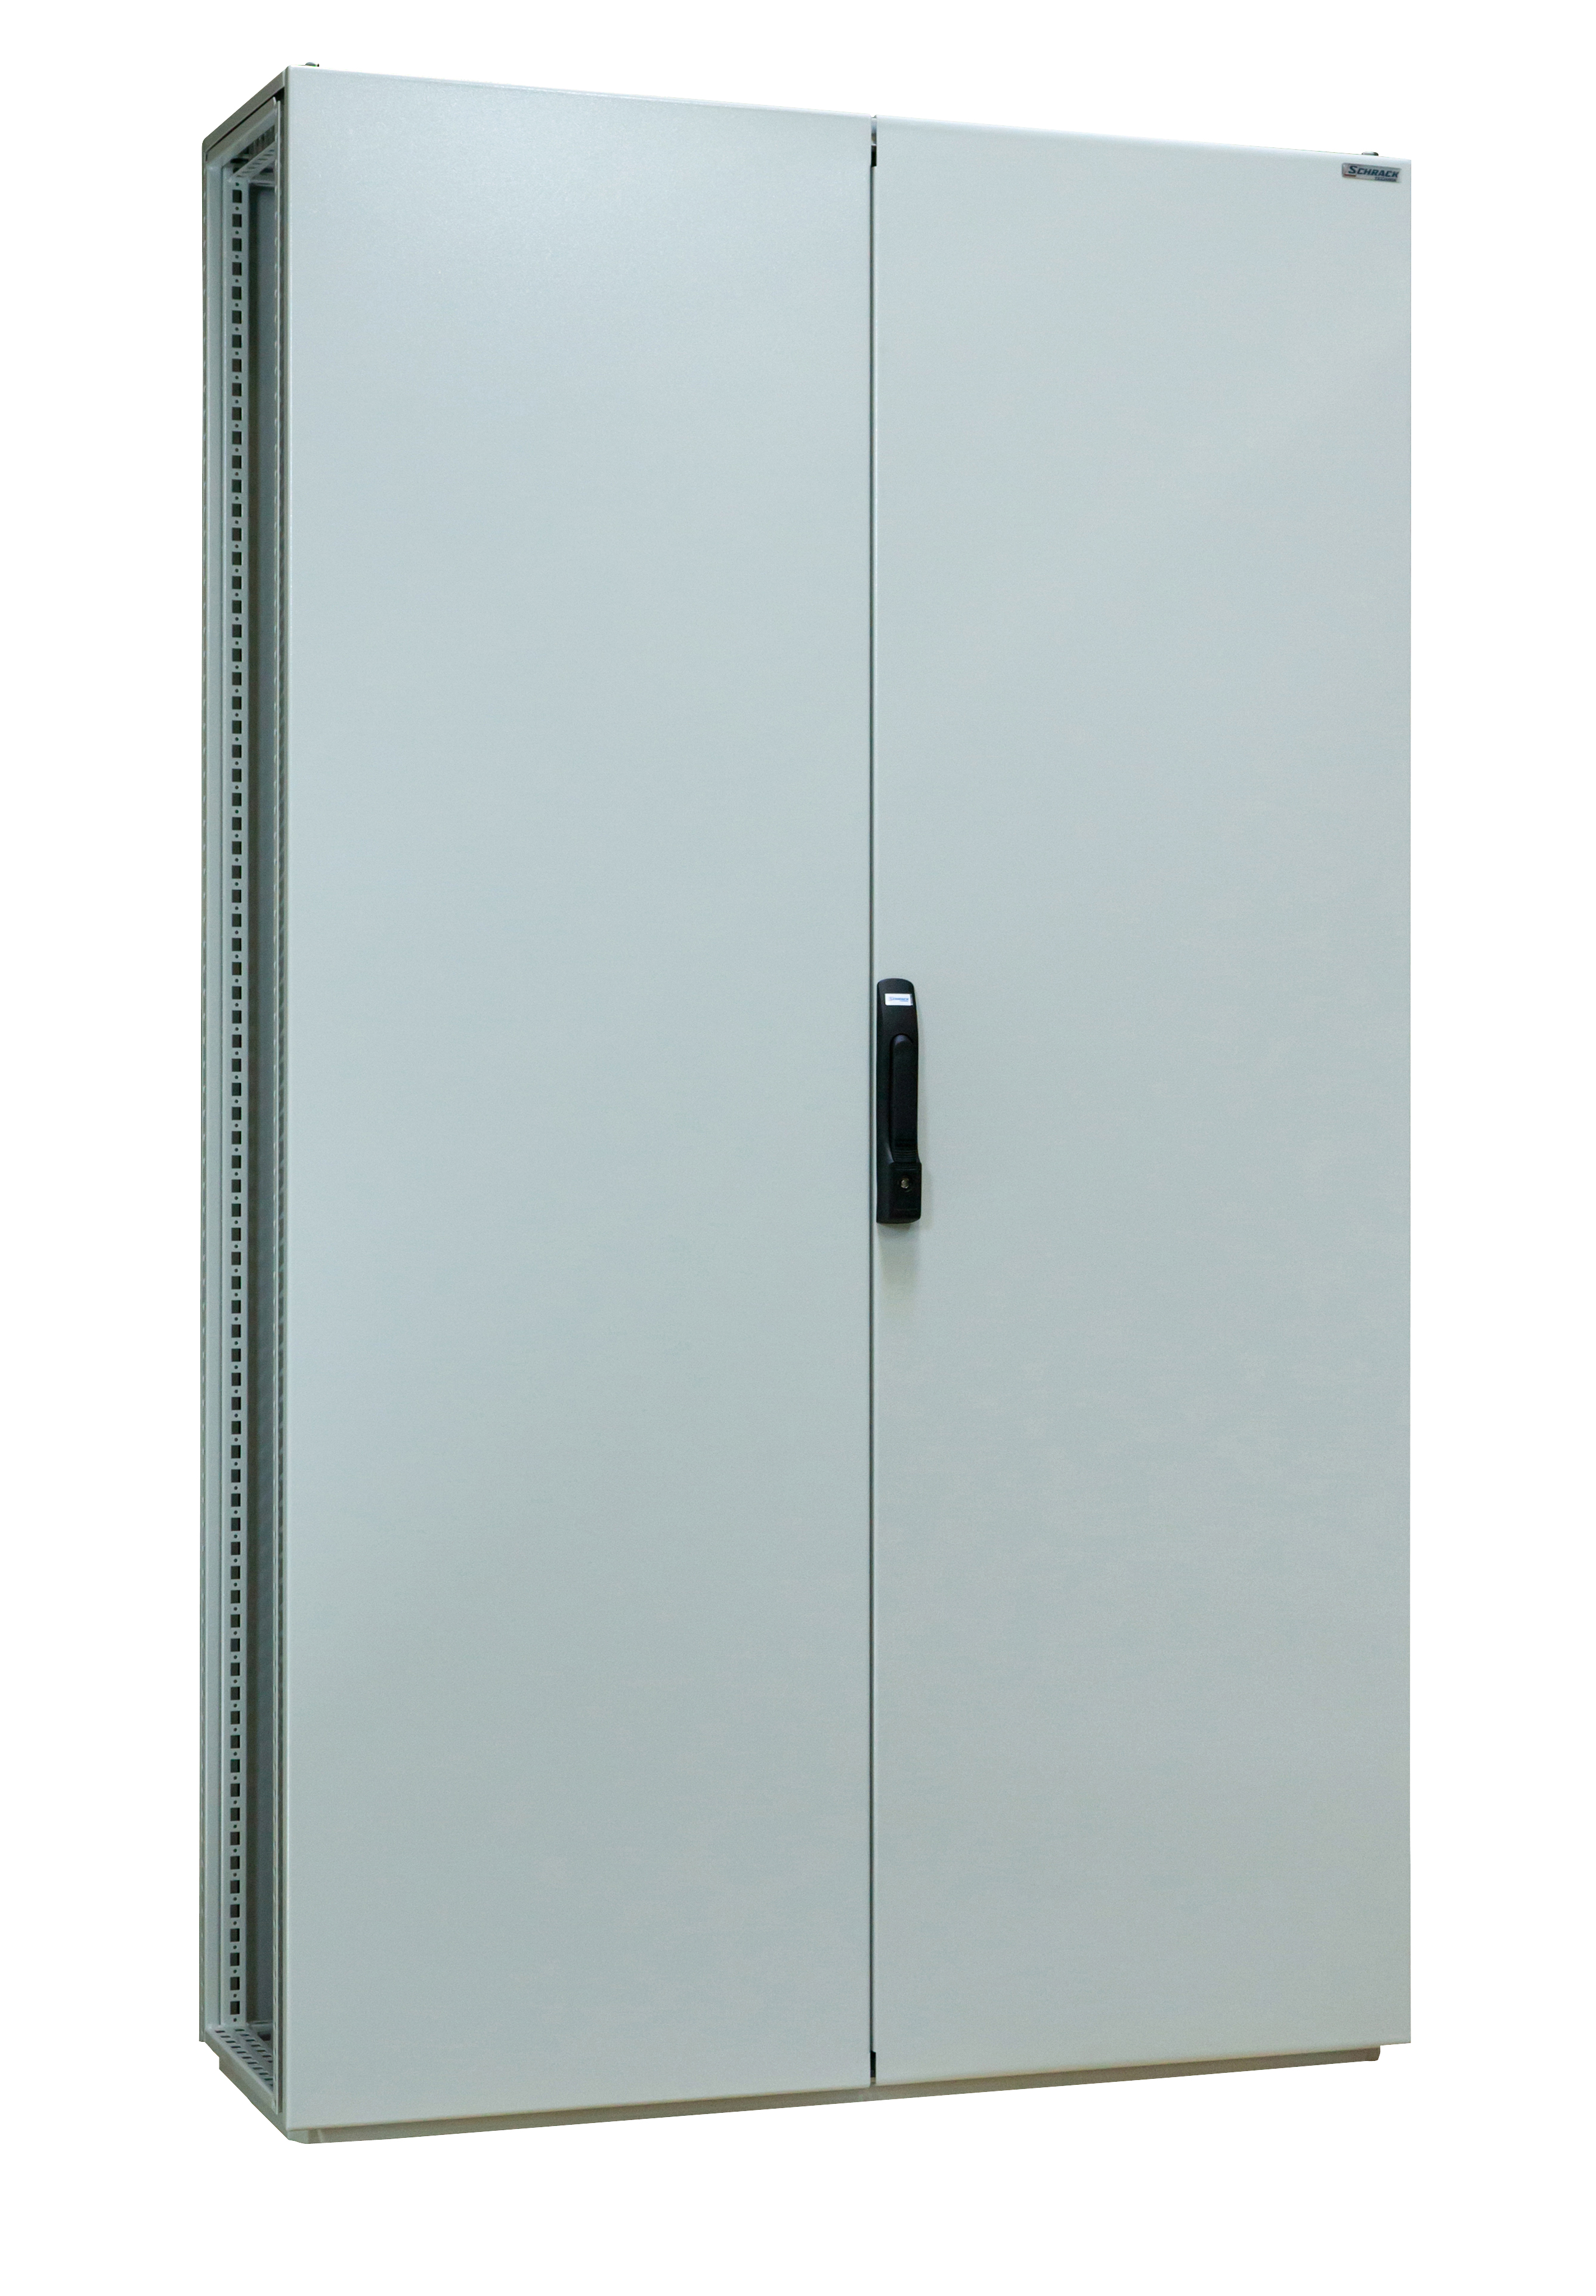 1 Stk Anreihschrank 2-türig, 2000x1200x600mm, RAL 7035 AS201262-5